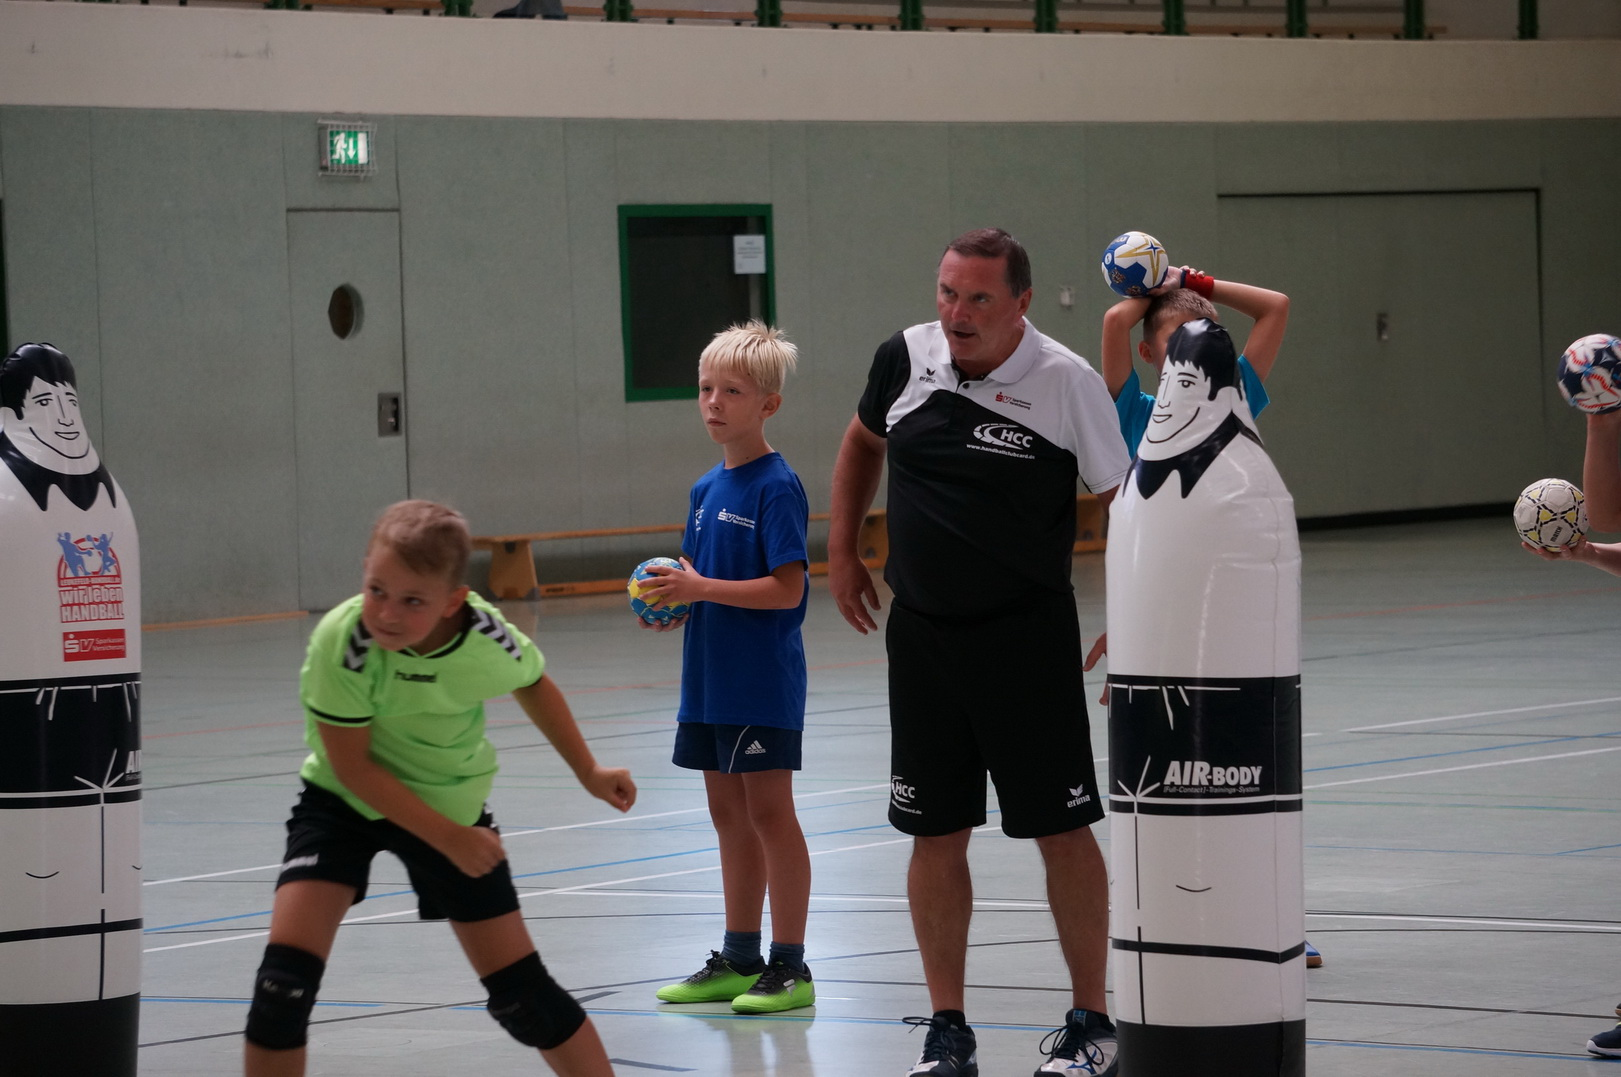 201808_Handballcamp_SDH_MG_228w